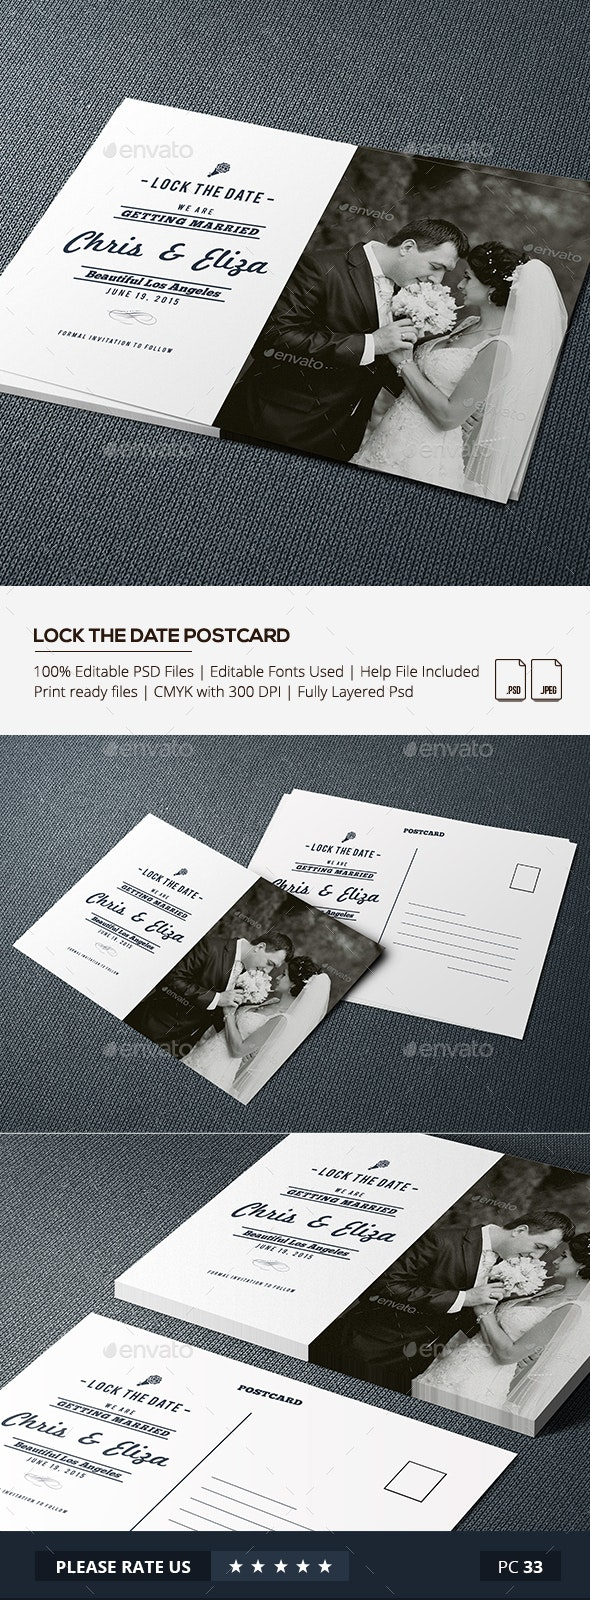 Wedding Lock the Date Postcard - Cards & Invites Print Templates